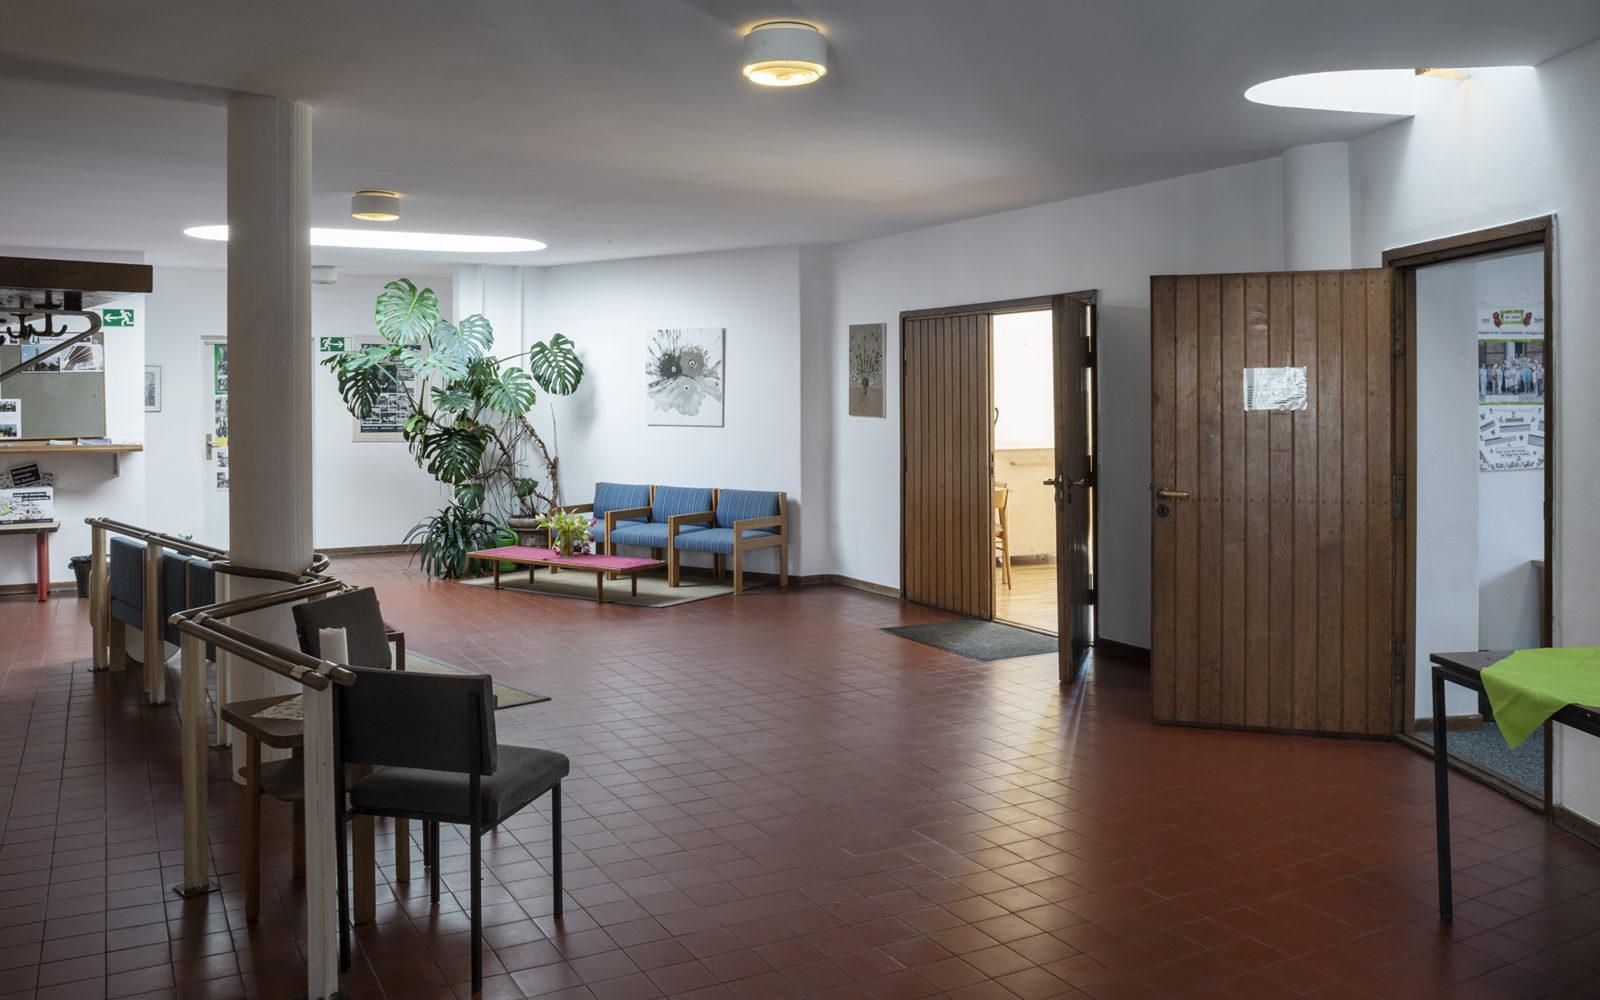 Wolfsburgin seurakuntakeskus